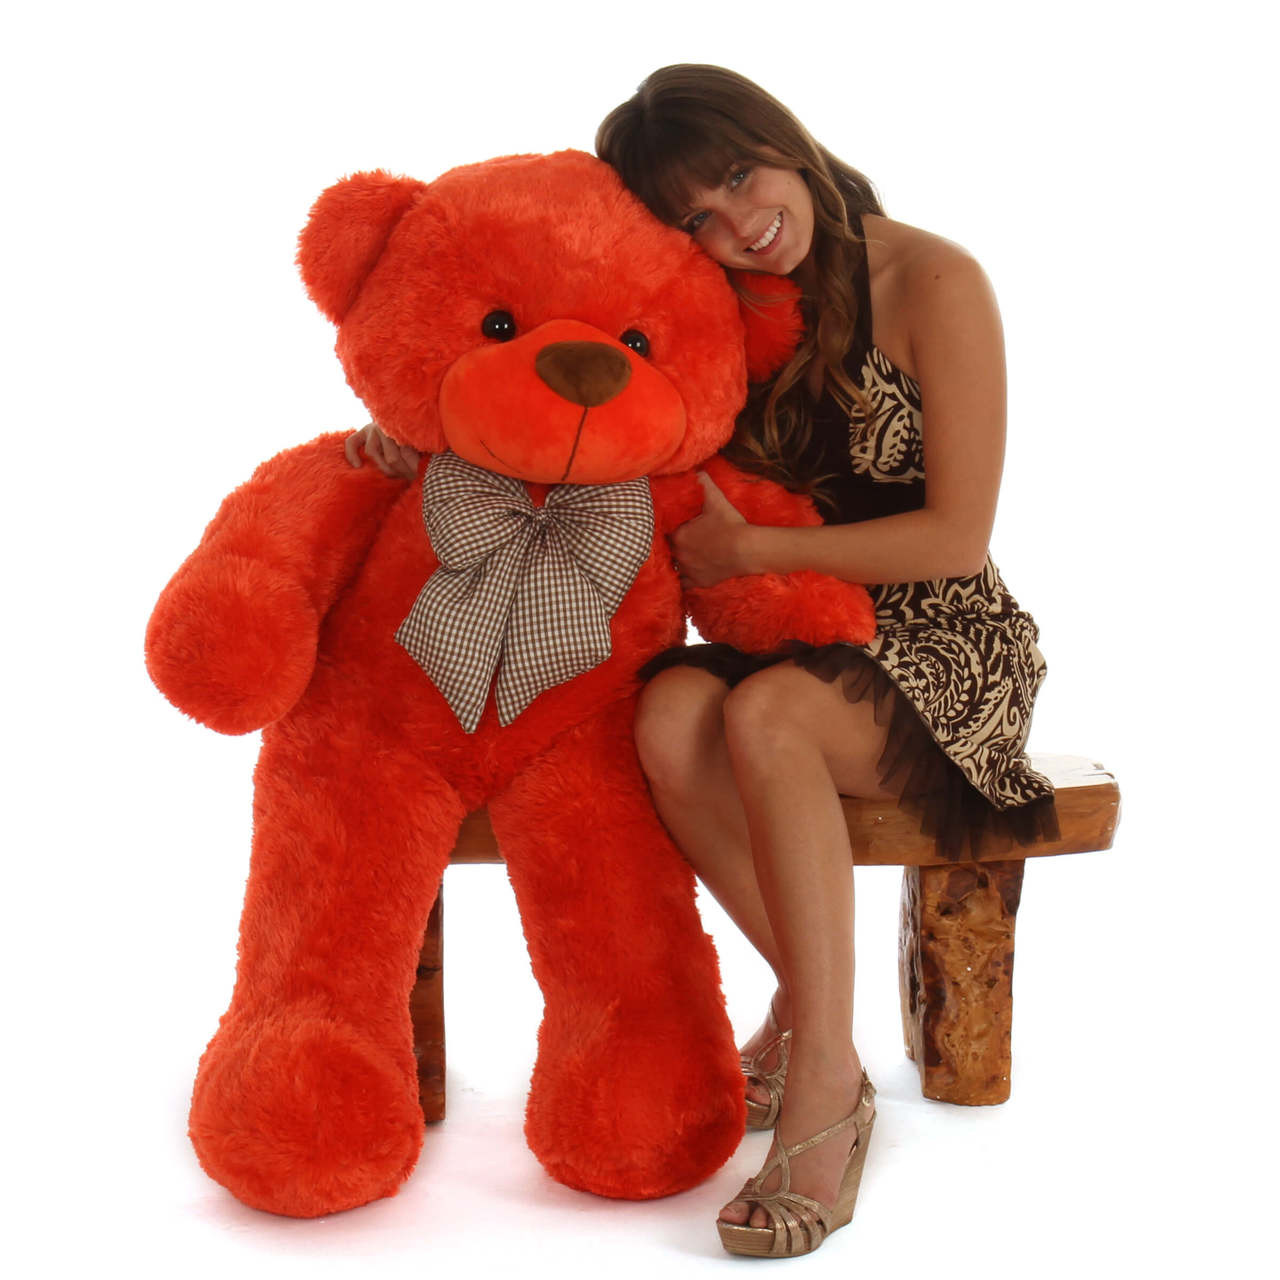 48in Life Size cute Teddy Bear Beautiful Orange Red cuddly soft  Unique Lovey Cuddles